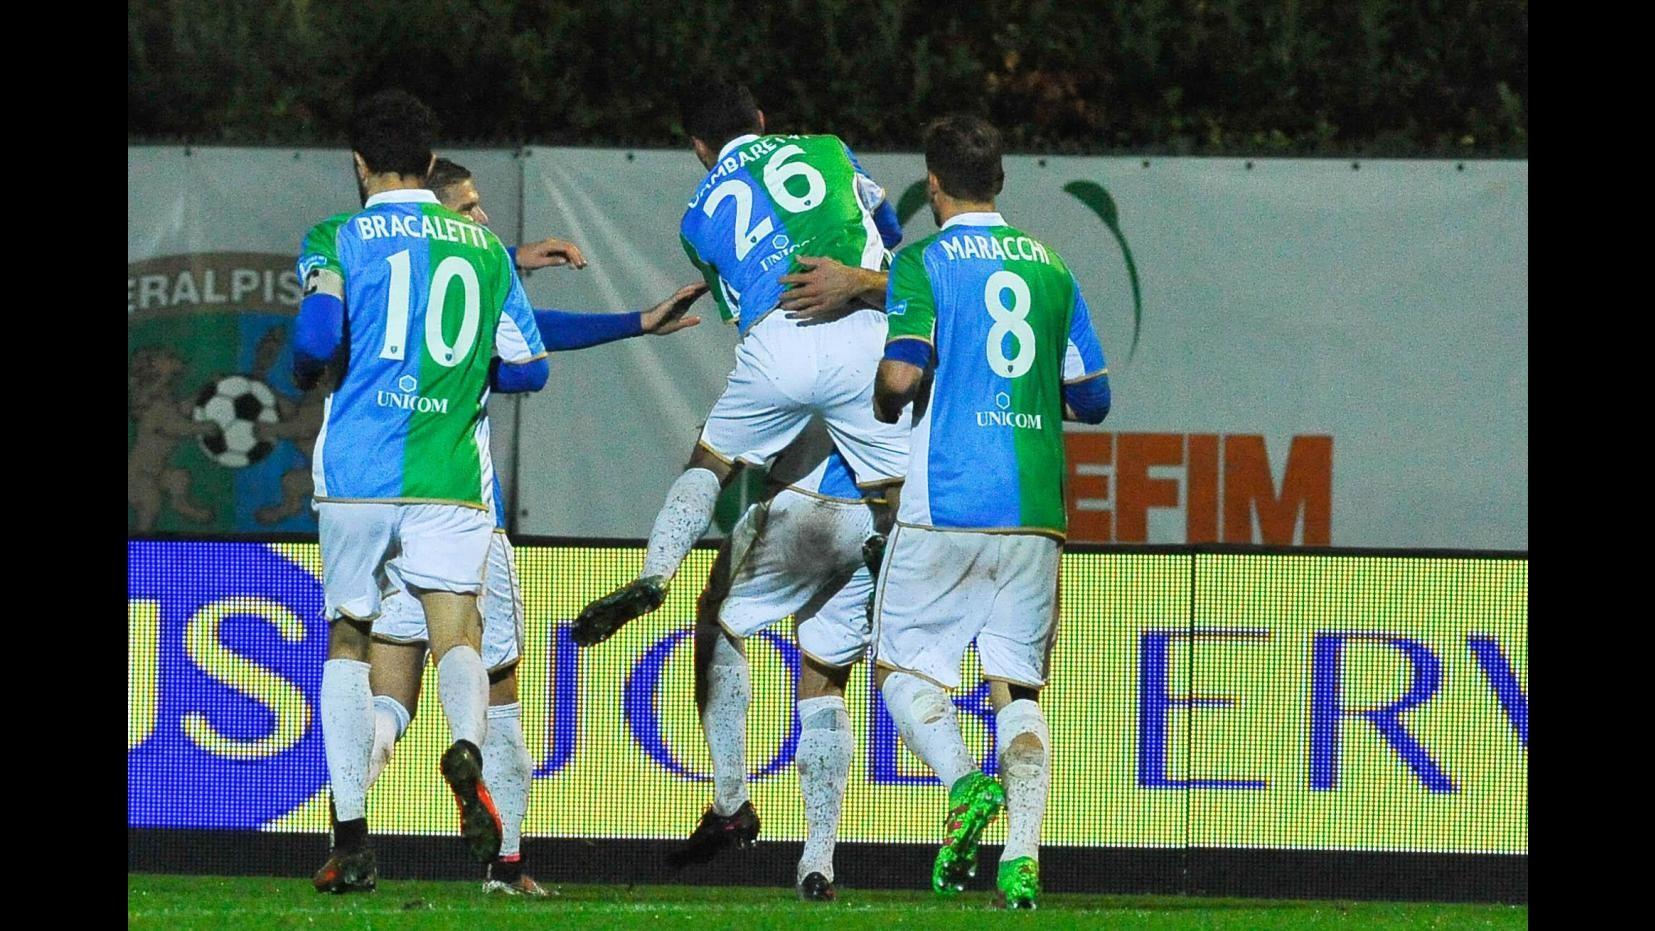 FOTO Lega Pro, FeralpiSalò-Maceratese finisce 2-0